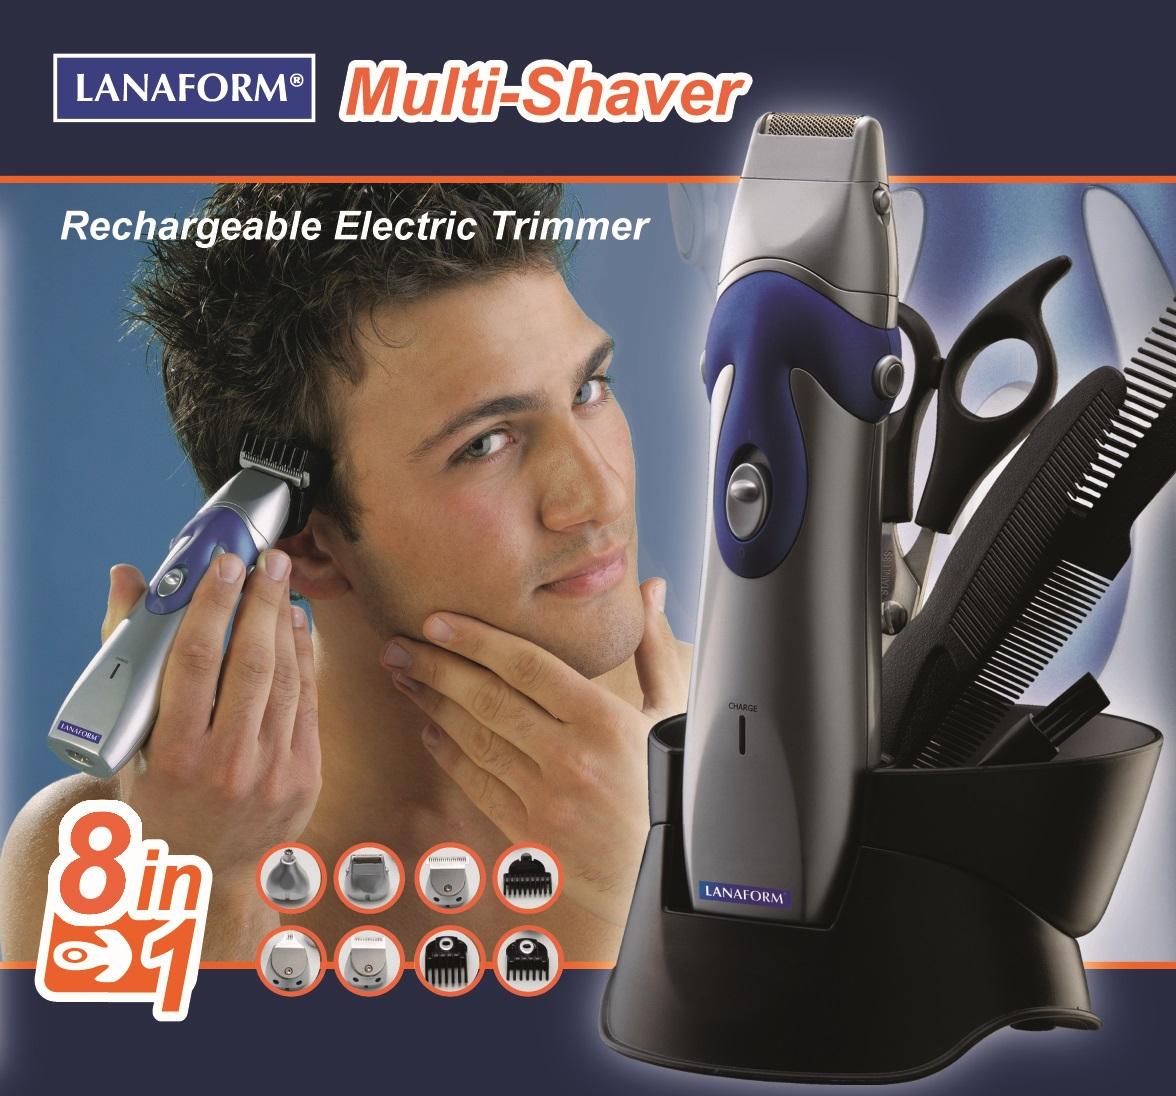 Lanaform Multi Shaver 8 in 1